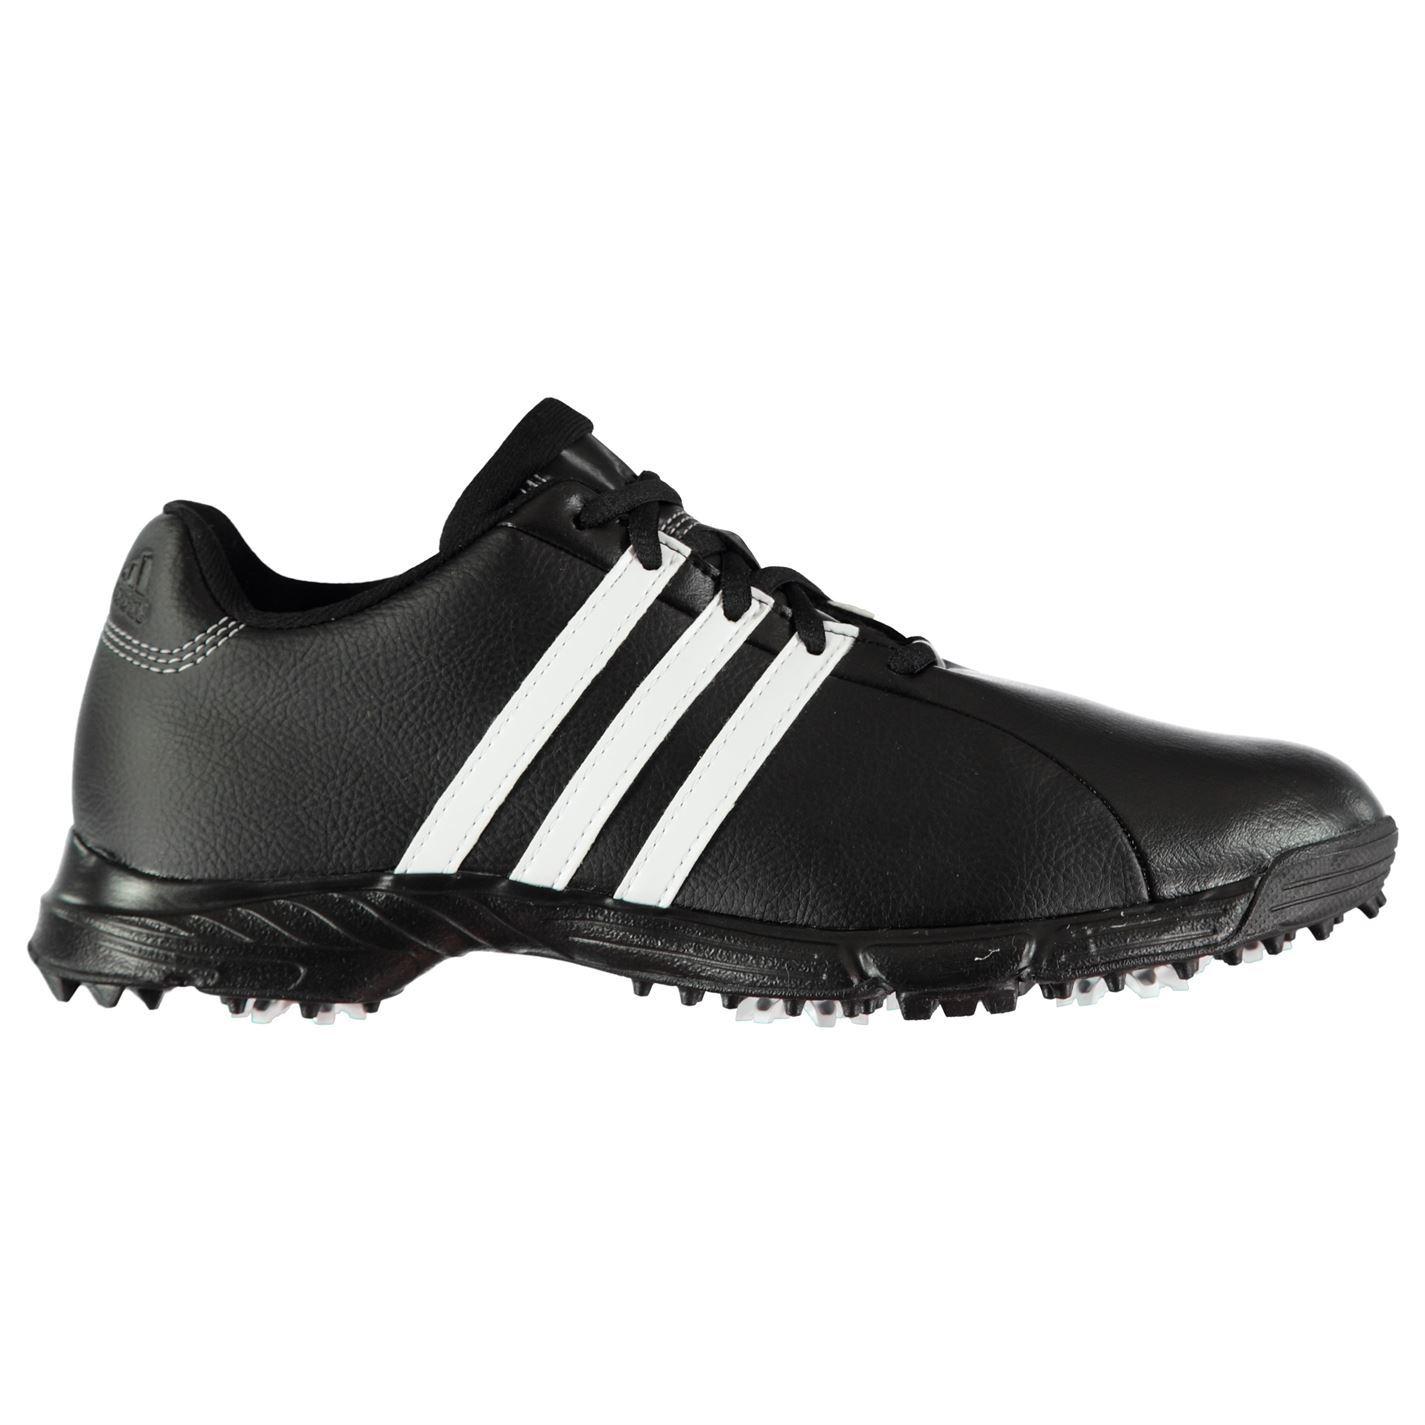 adidas-Golflite-Golf-Shoes-Mens-Spikes-Footwear thumbnail 8